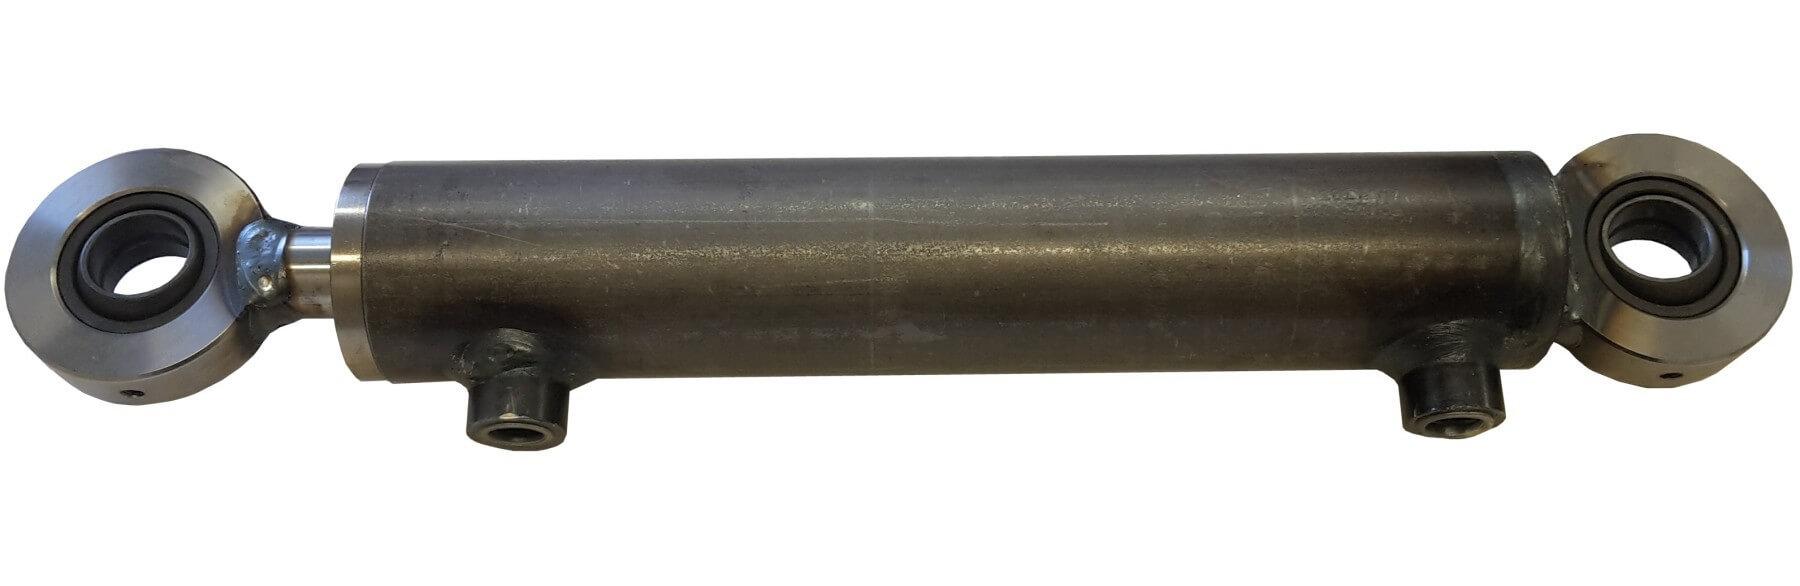 Hydraulisylinteri CL 50. 30. 1000 GE